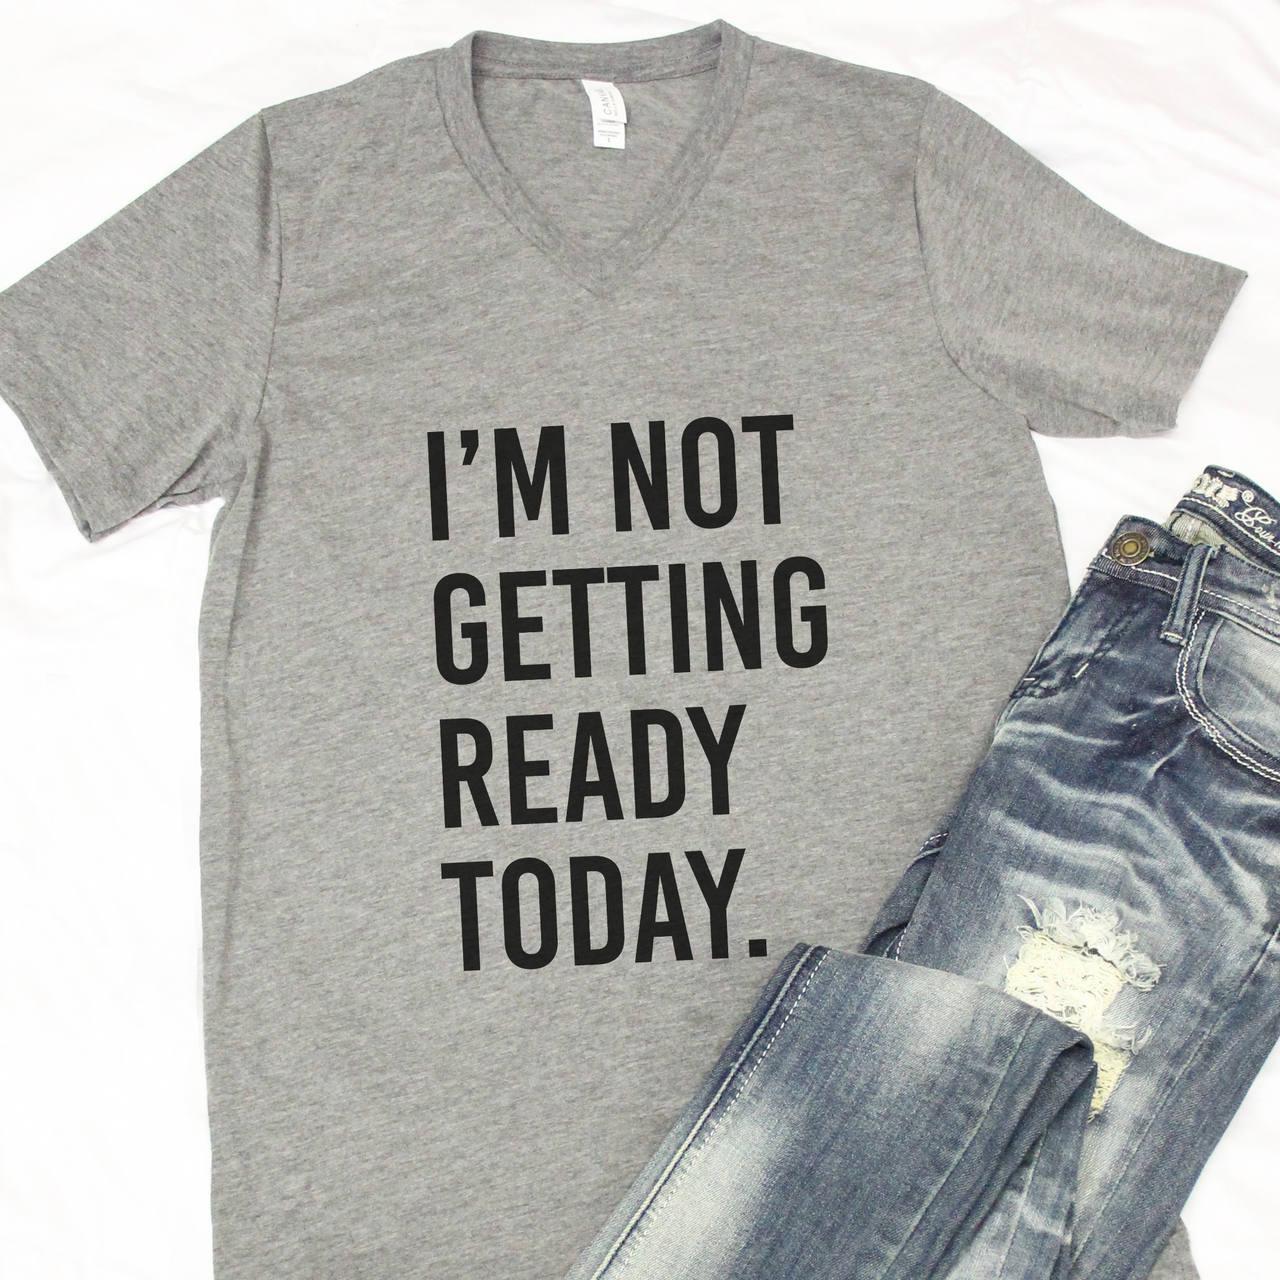 35e724530 I'm Not Getting Ready Today V-Neck Graphic Tee..Sassy | Etsy